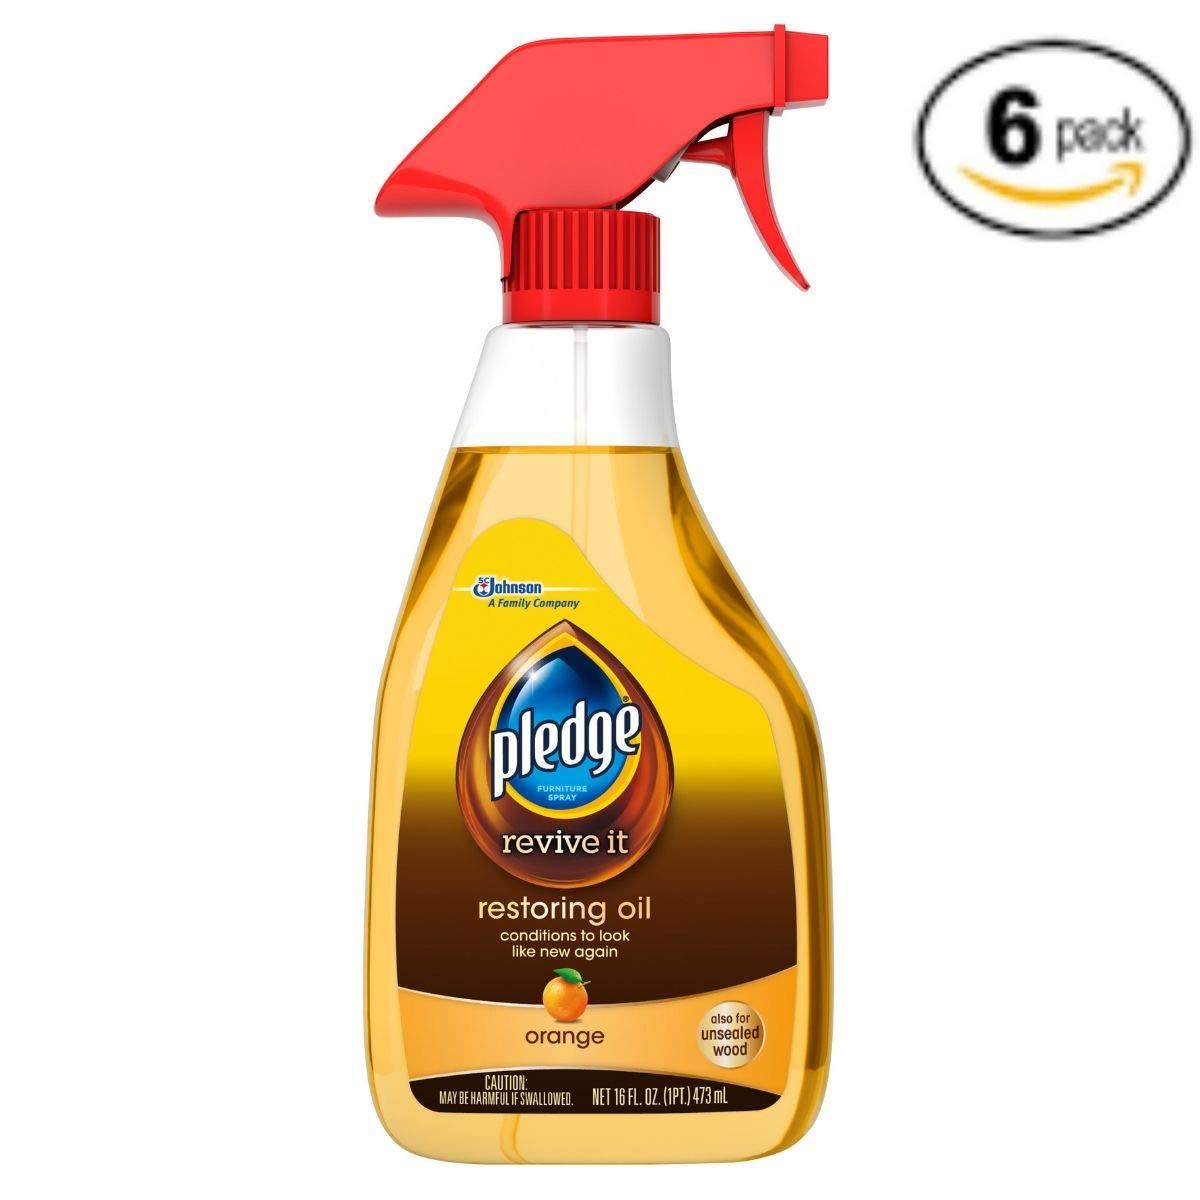 Pledge Restoring Oil Trigger, Orange, 16 Fluid Ounces (6 Pack)